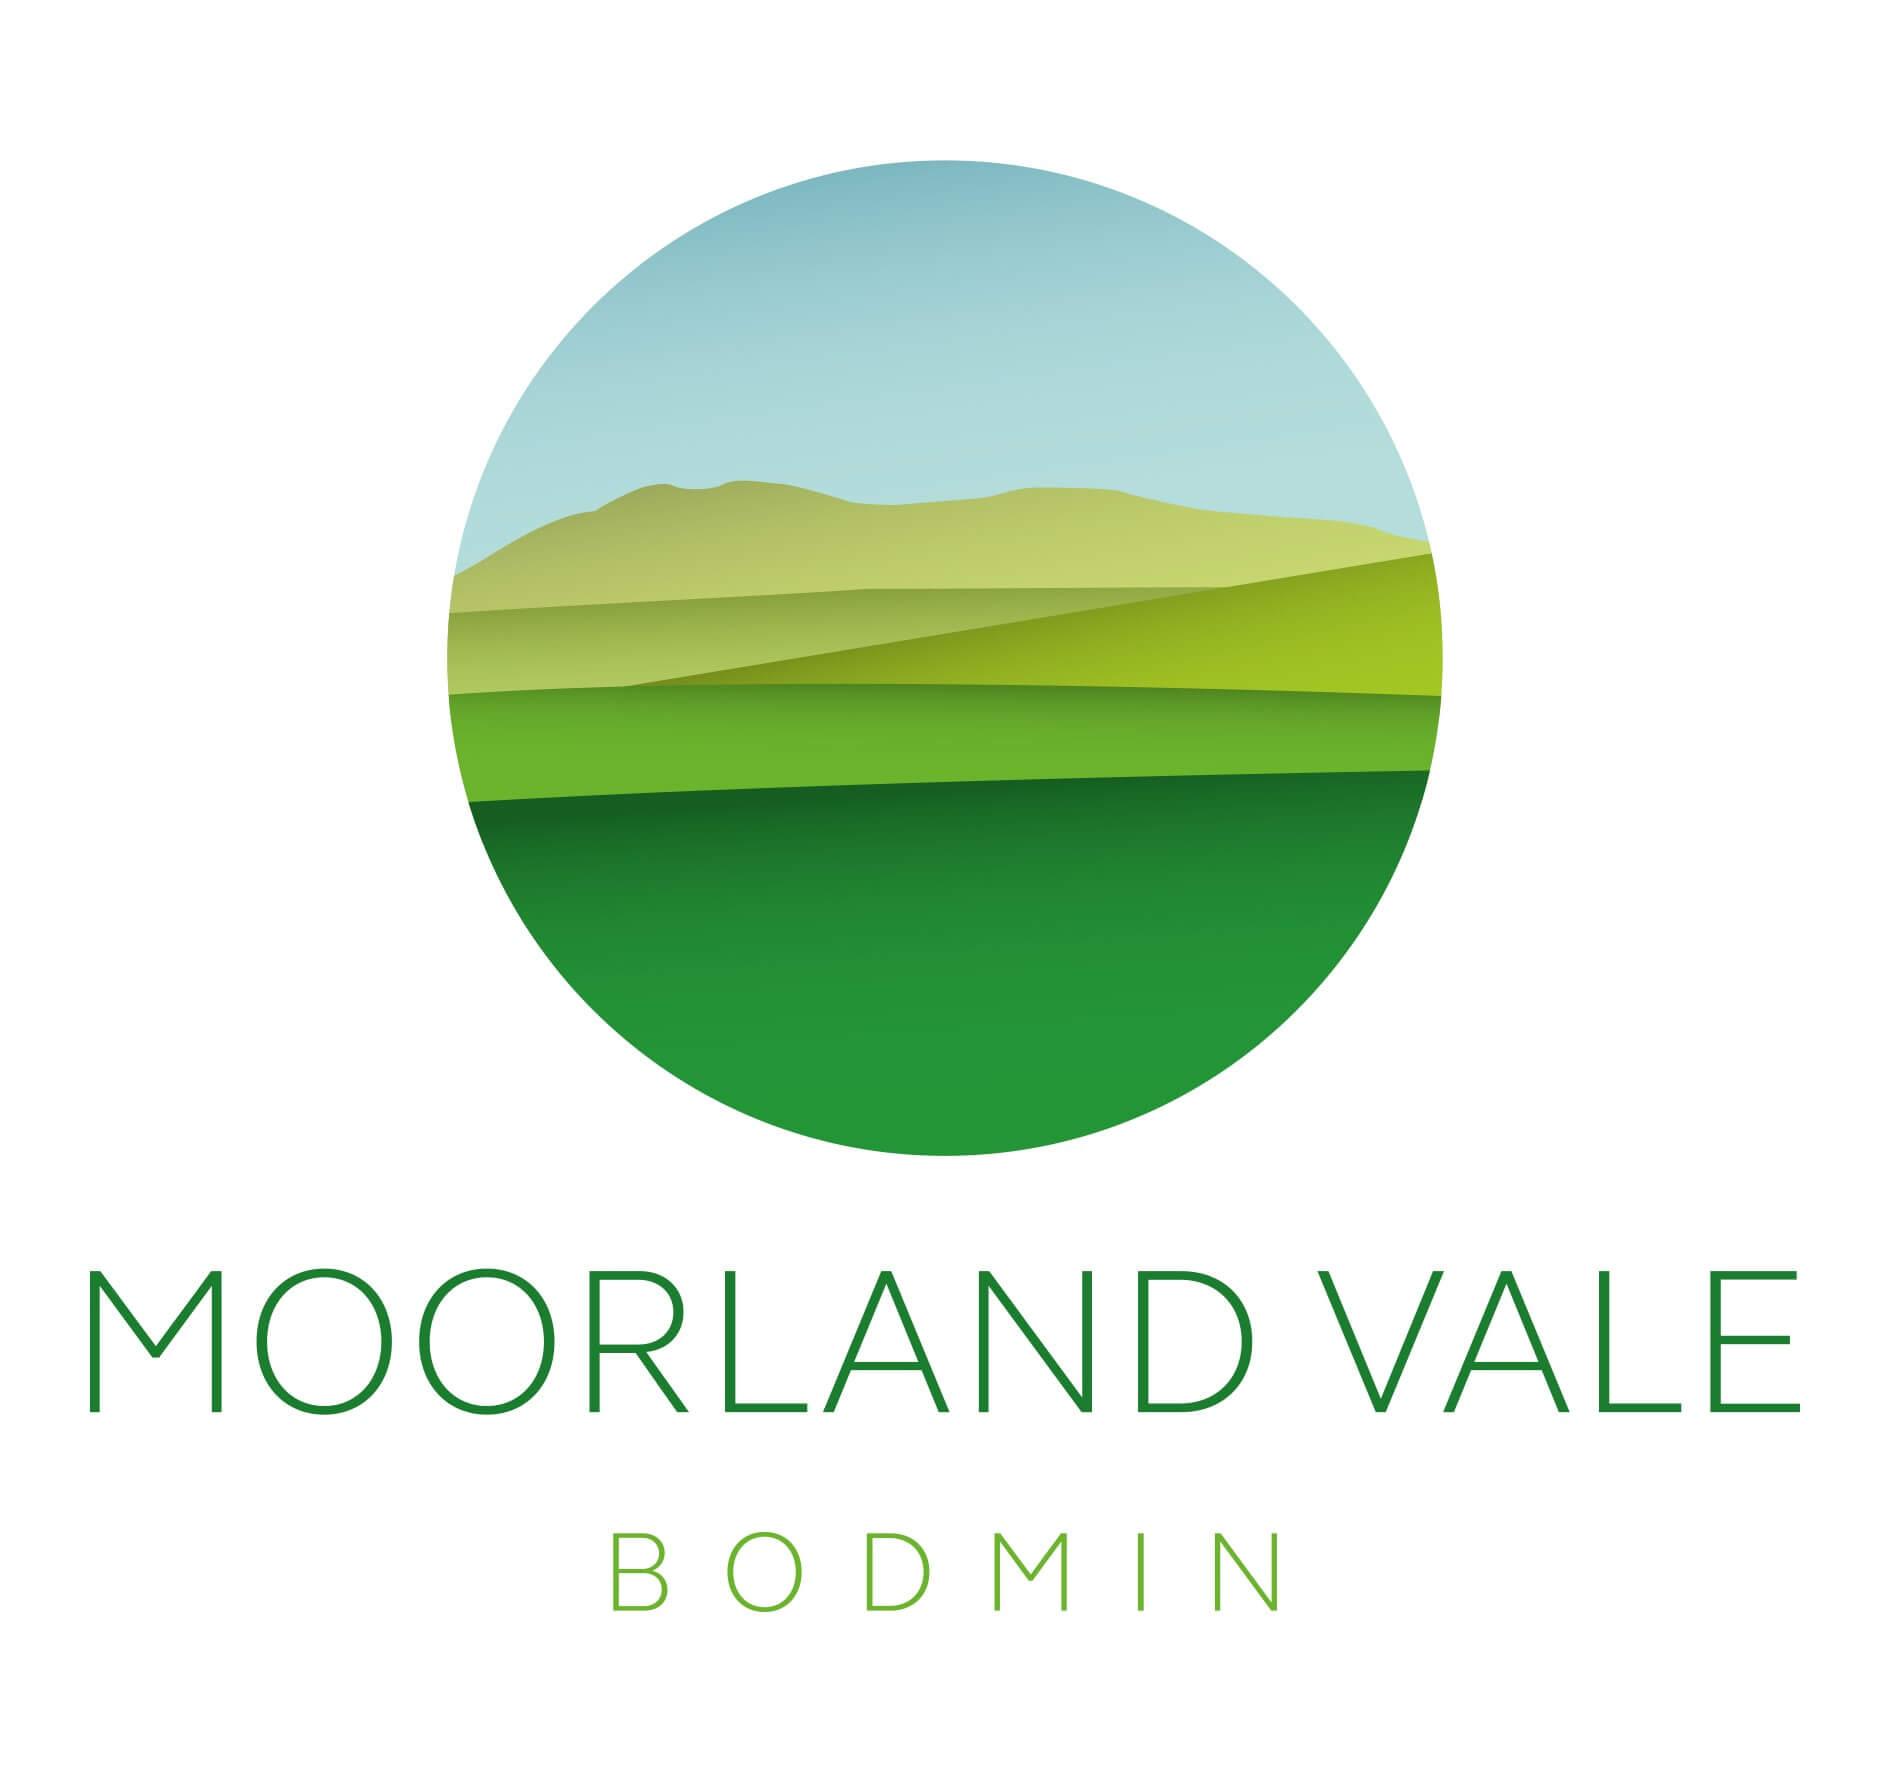 Moorland Vale New logo